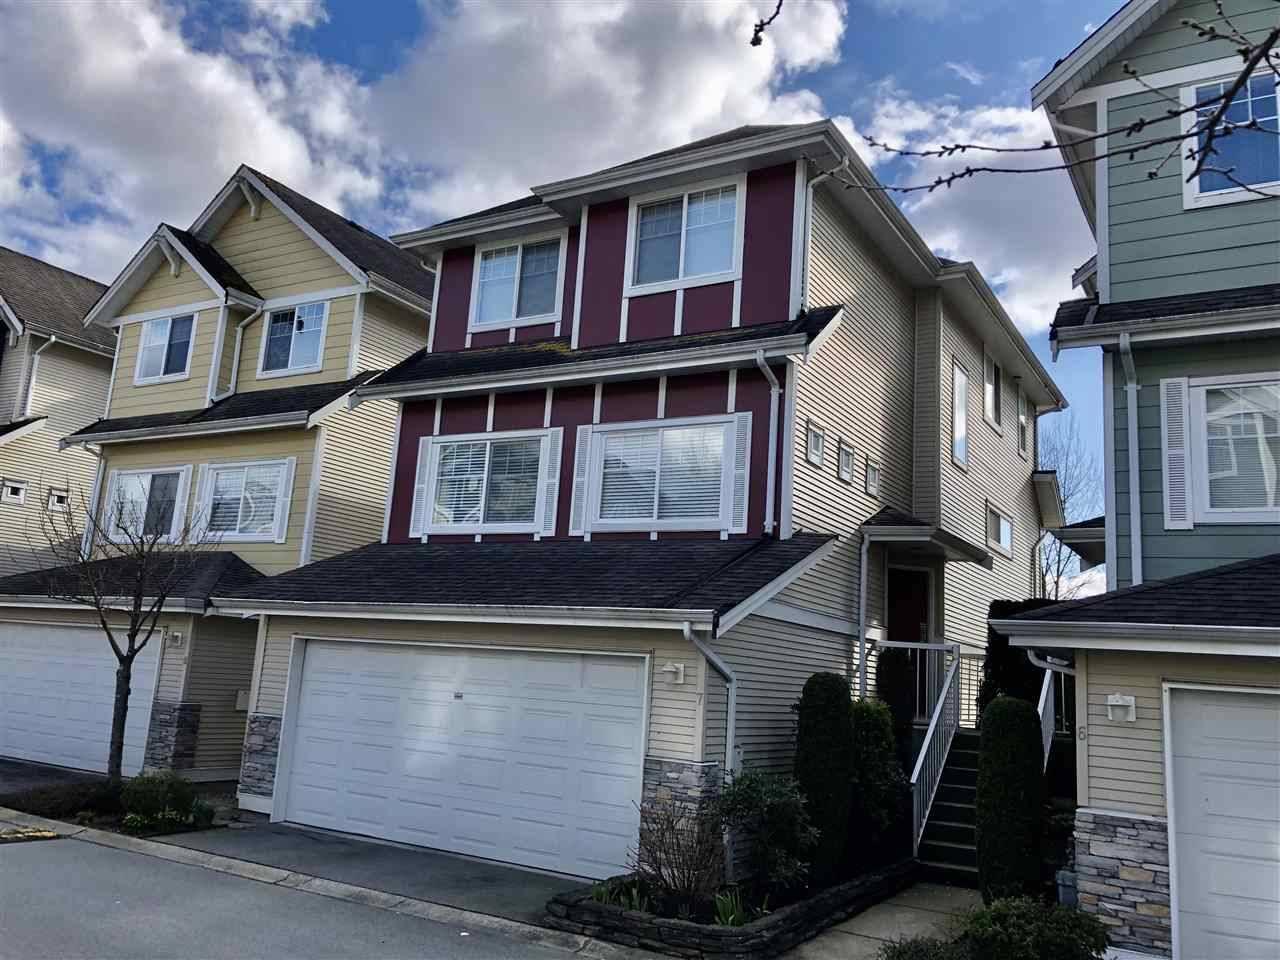 Buliding: 1108 Riverside Close, Port Coquitlam, BC